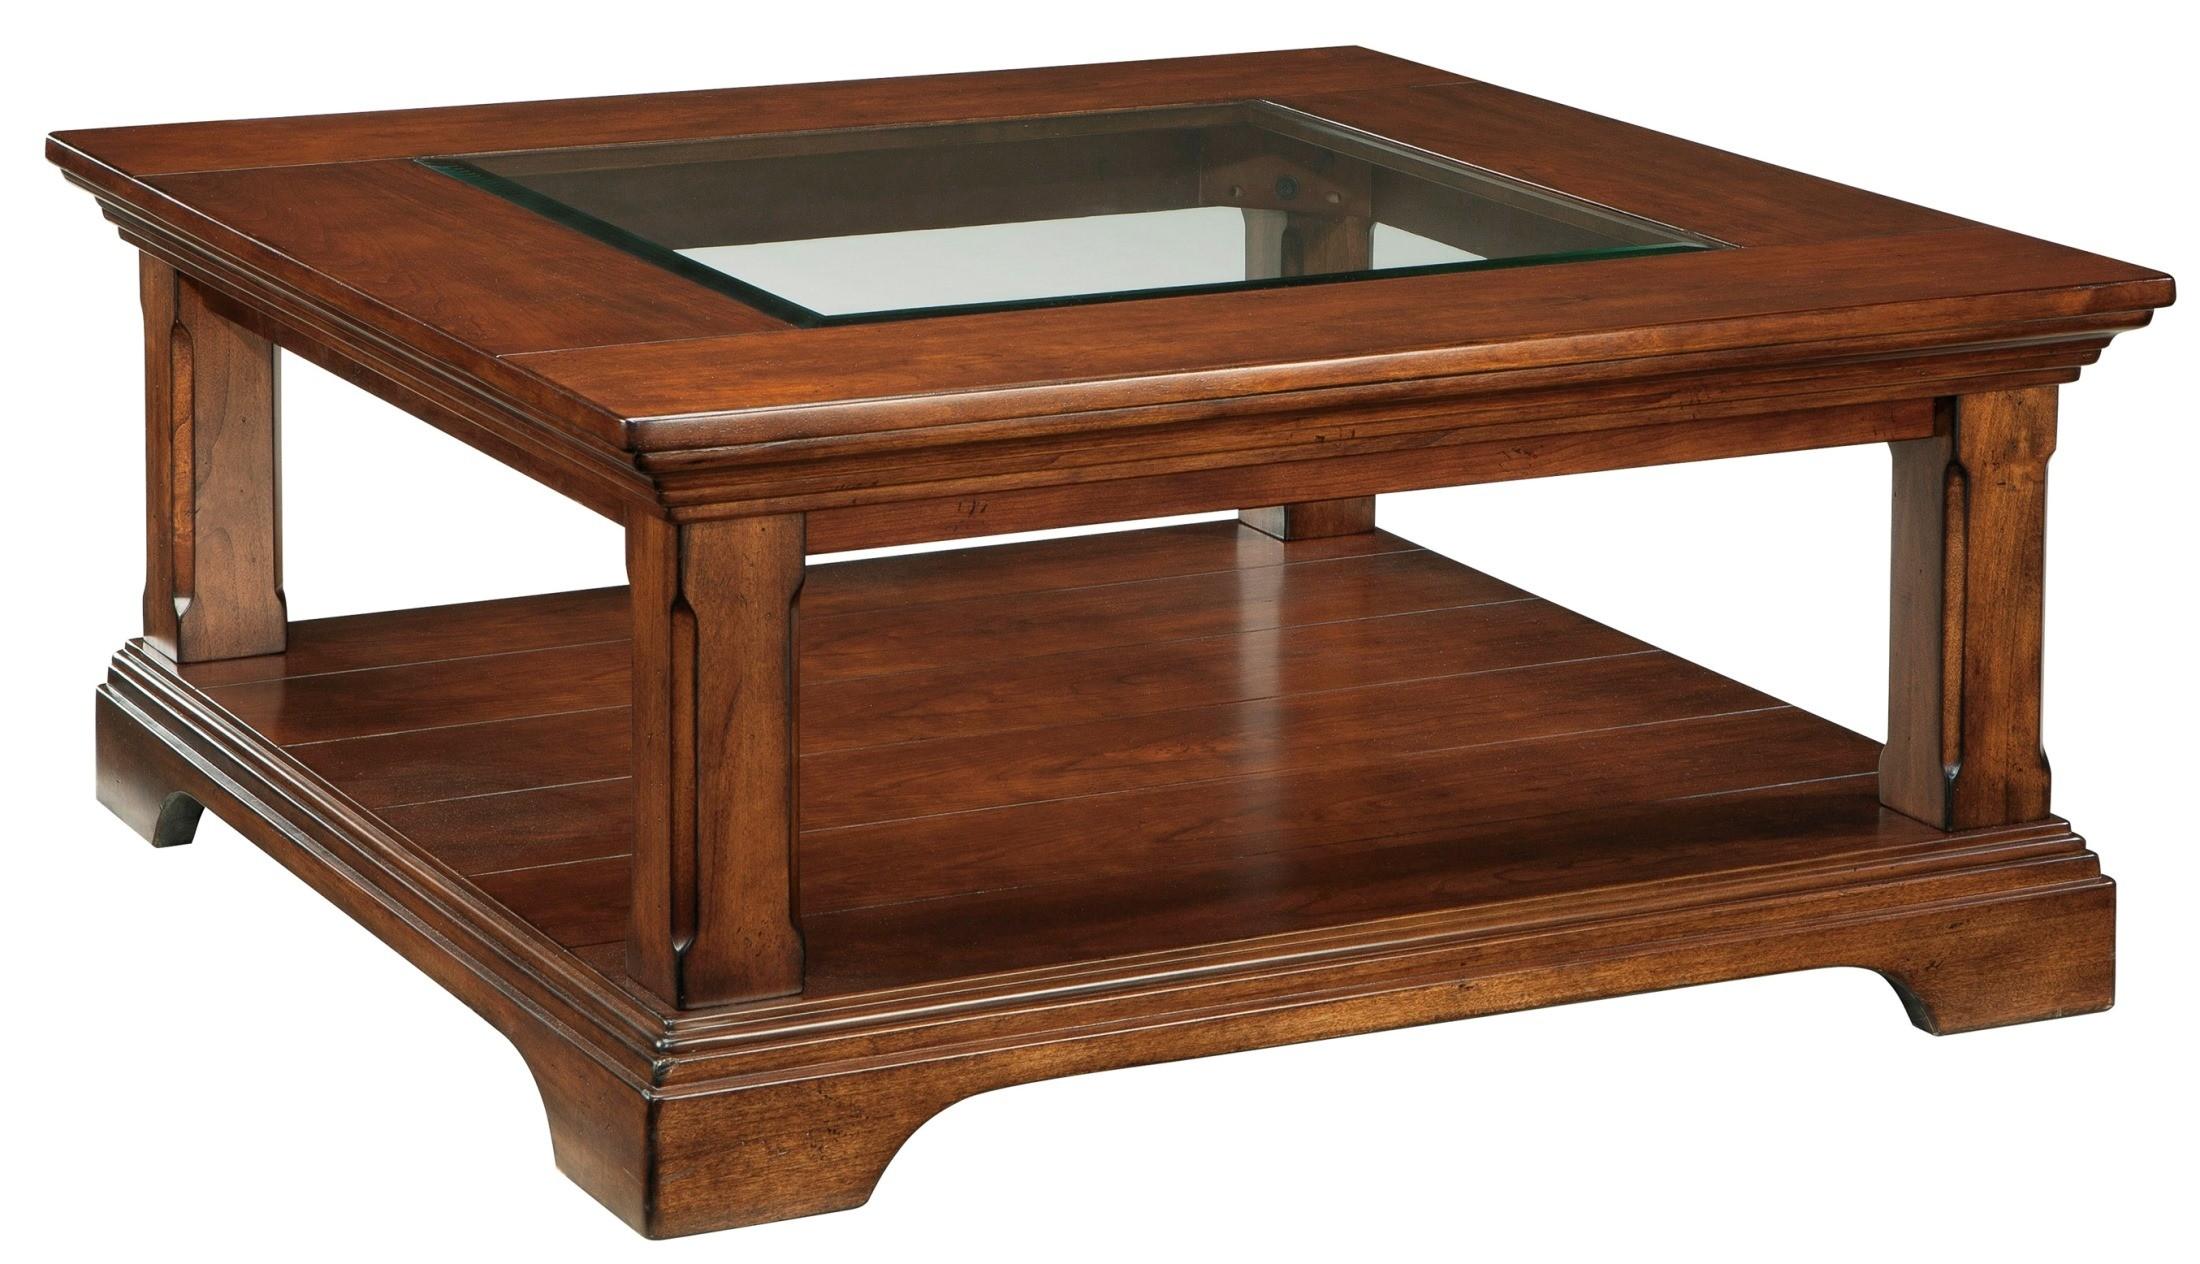 Gaylon square cocktail table t740 8 ashley furniture for Square cocktail table